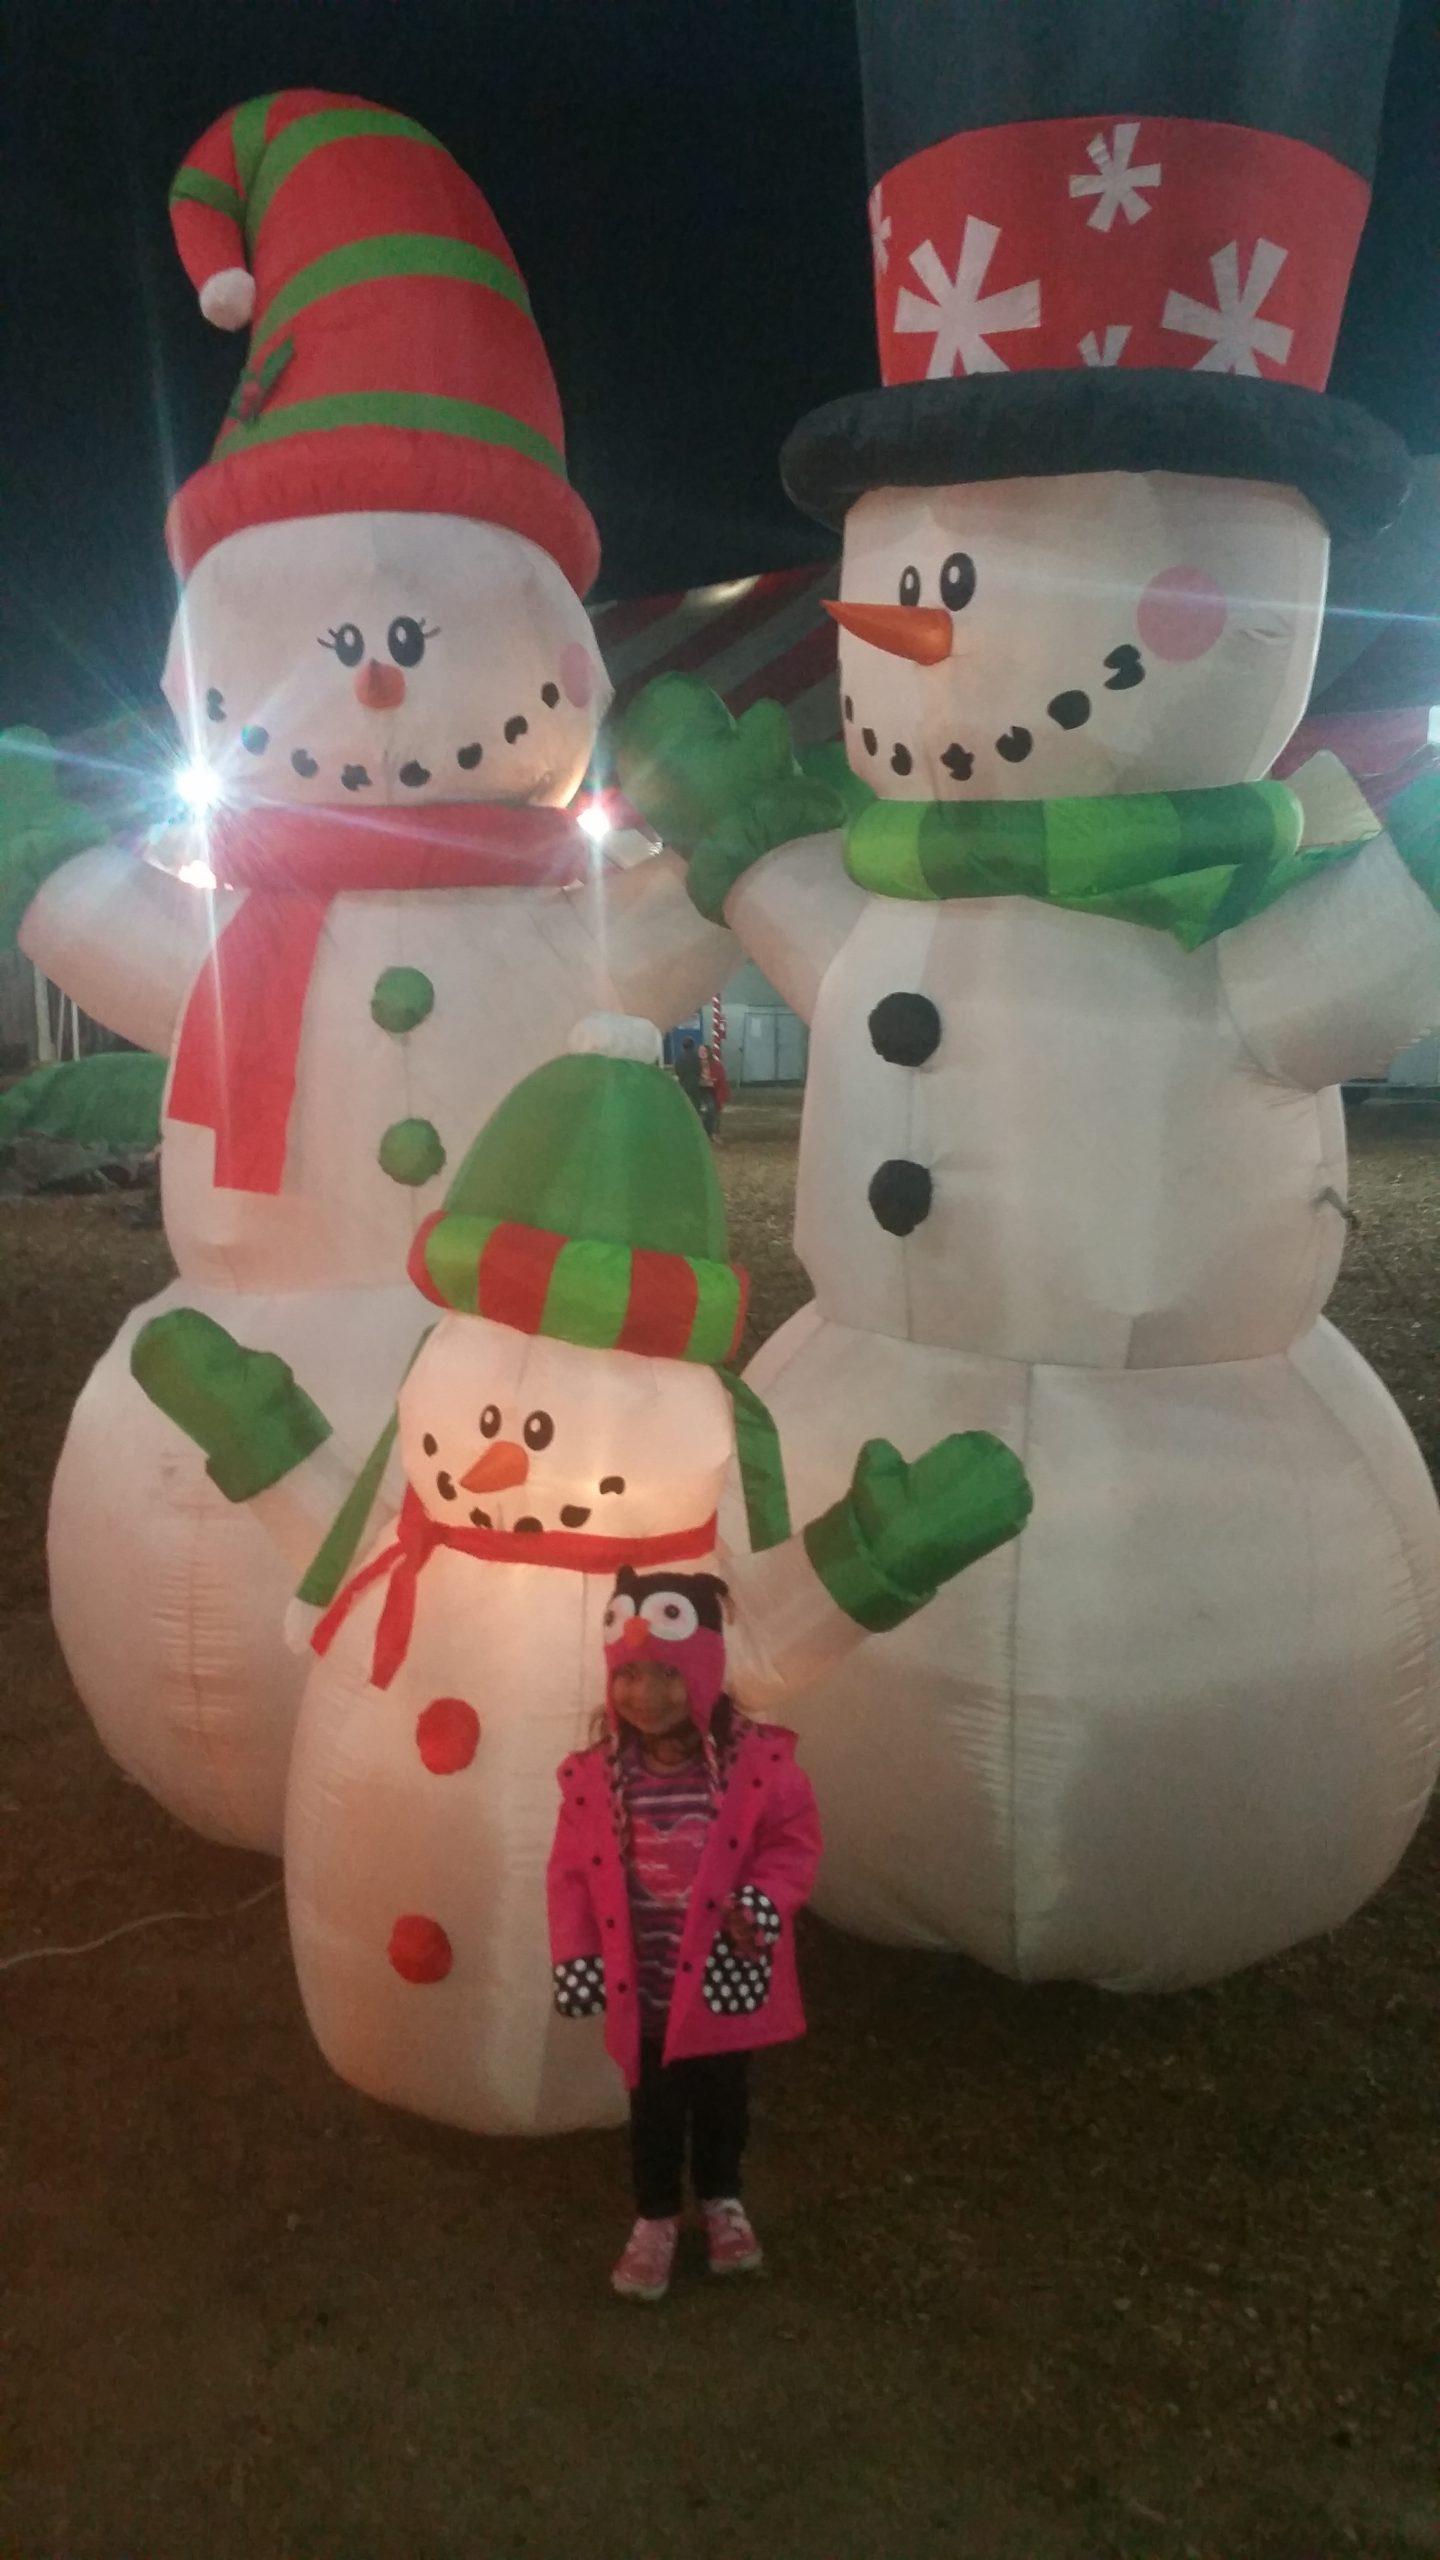 ChristmasTreeVillageGallery (8)